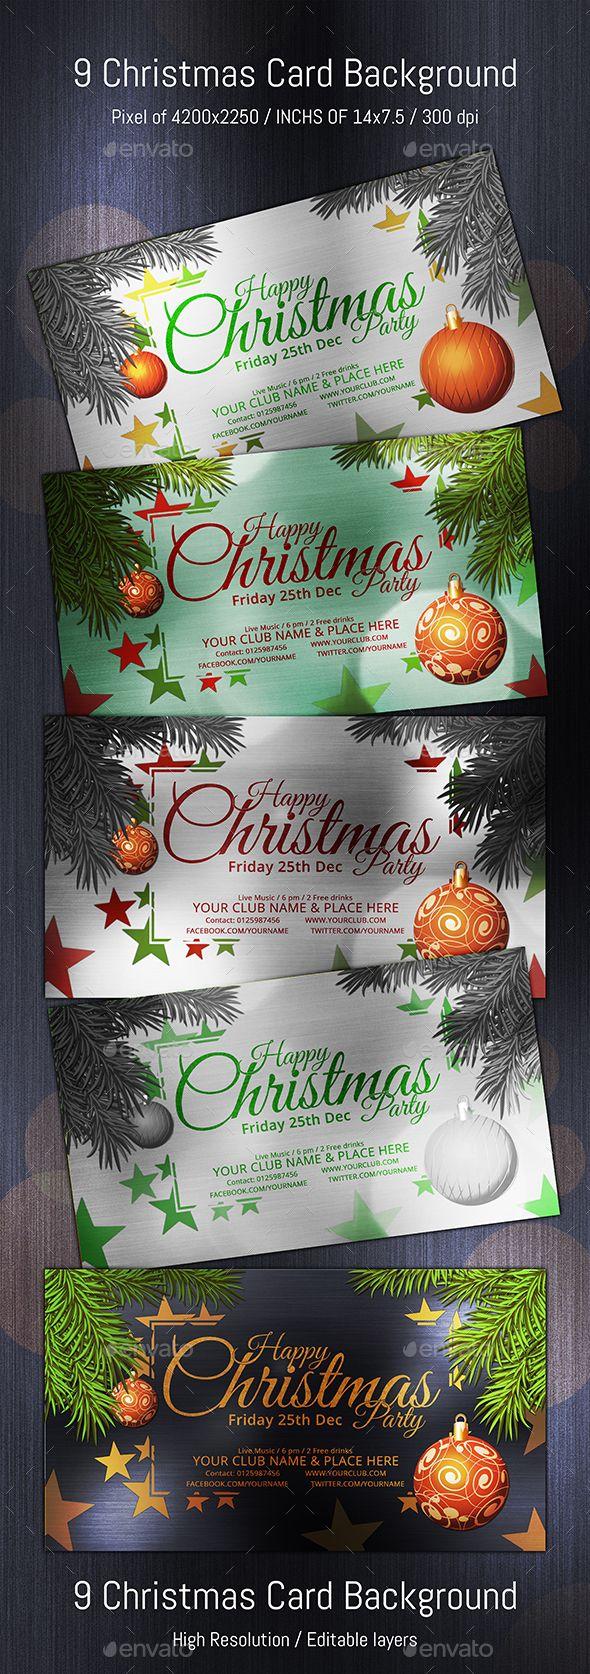 Christmas Typo Star Volume 02 Christmas Card Background Christmas Flyer Invitation Card Design